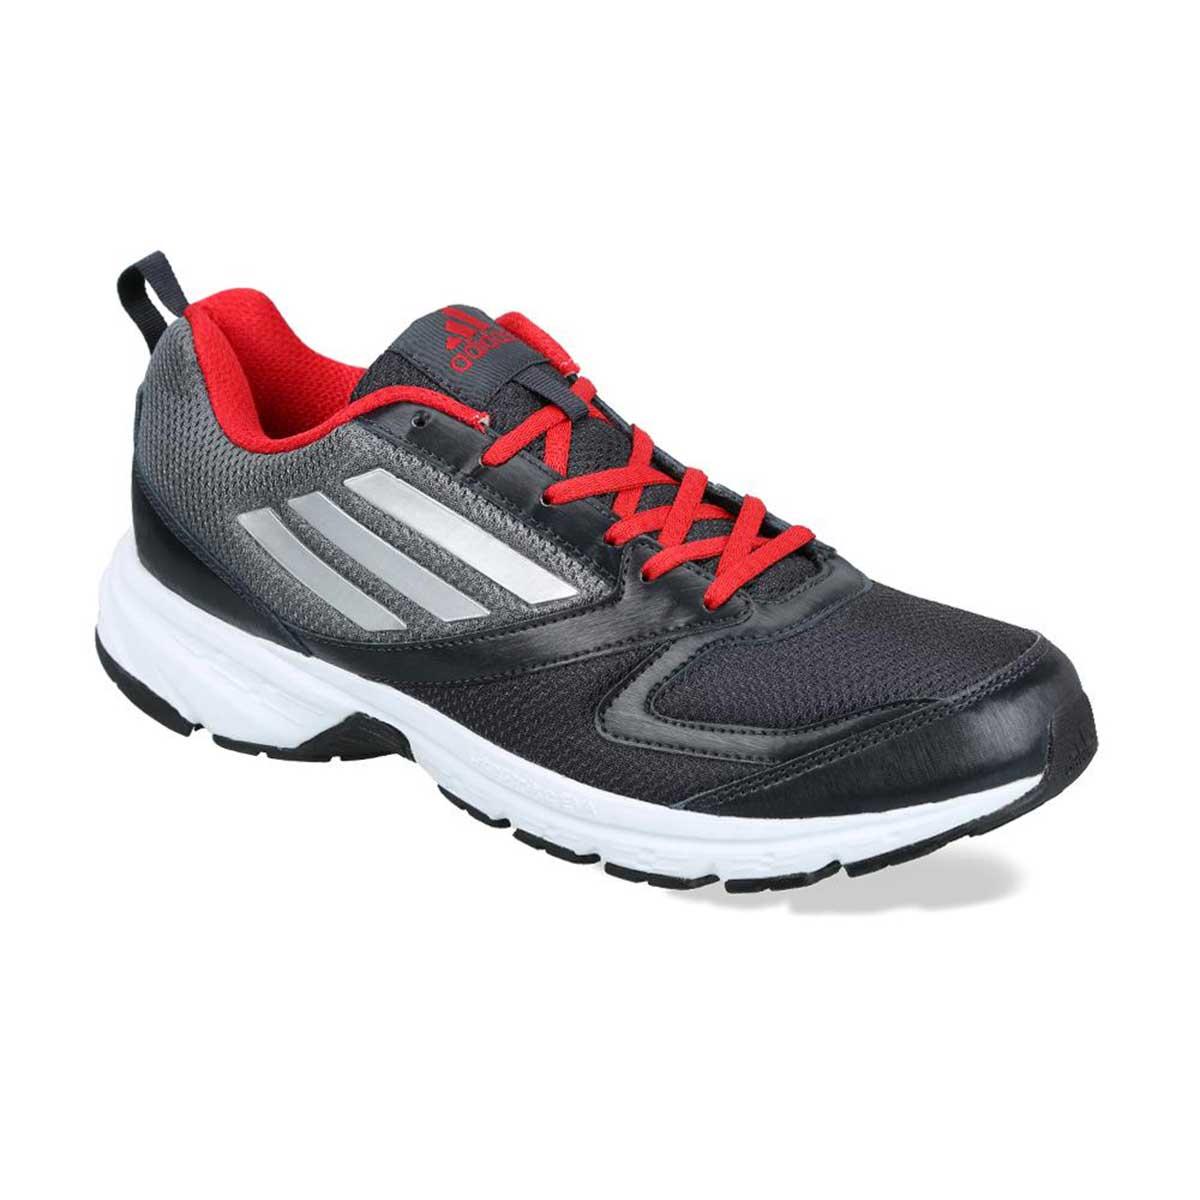 Buy Adidas Adimus Men's Running Shoes